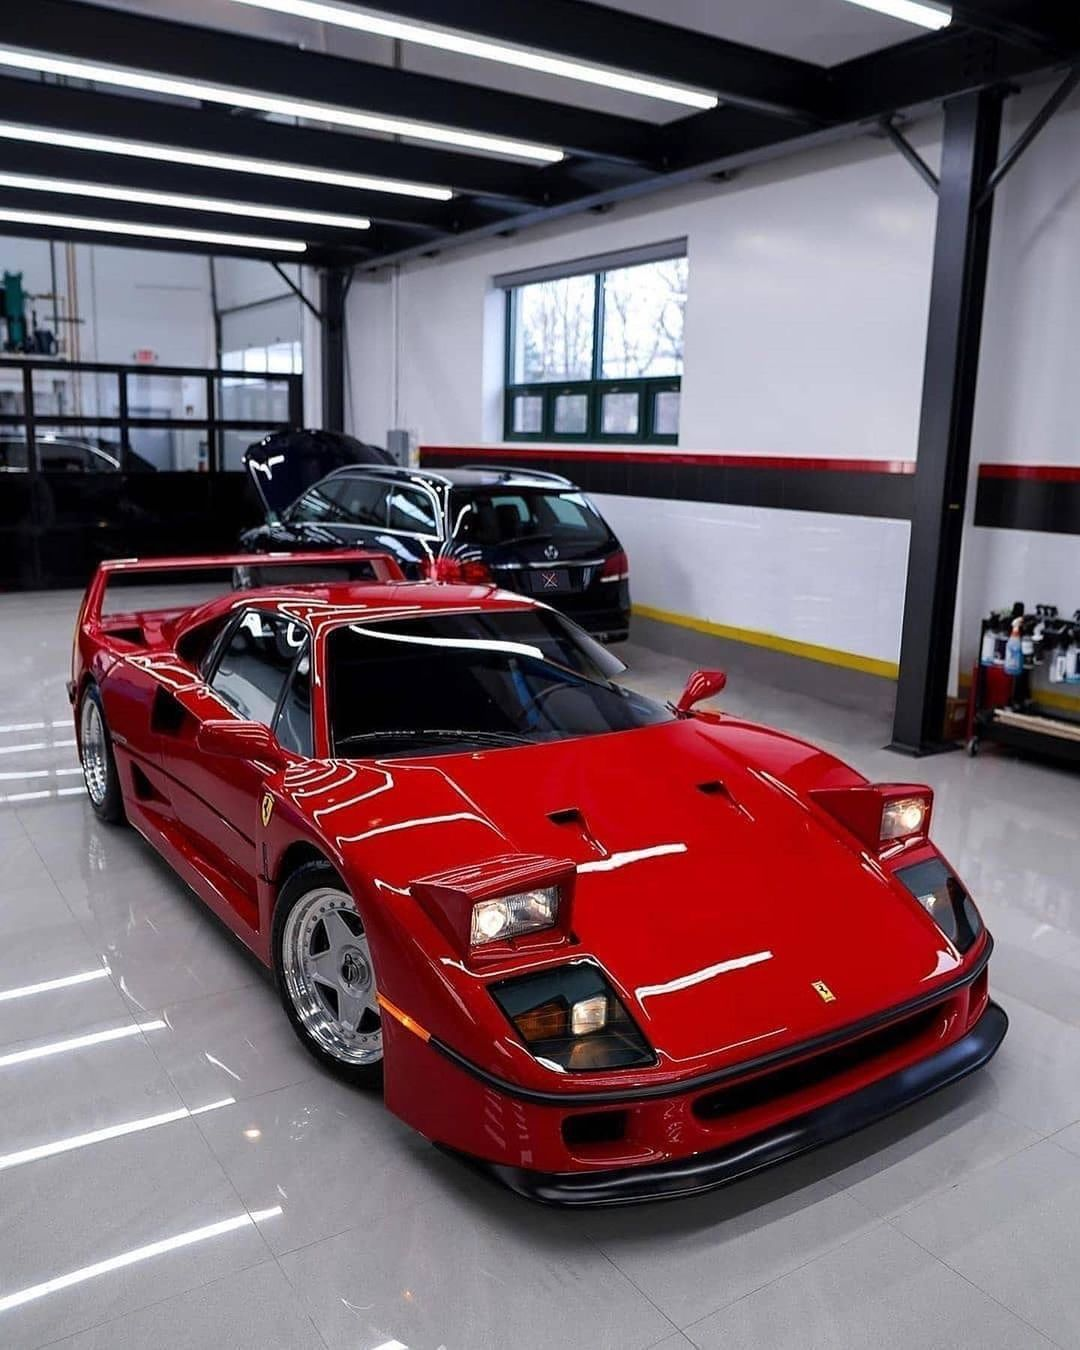 390 Ferrari Ideas In 2021 Ferrari Ferrari F1 Race Cars